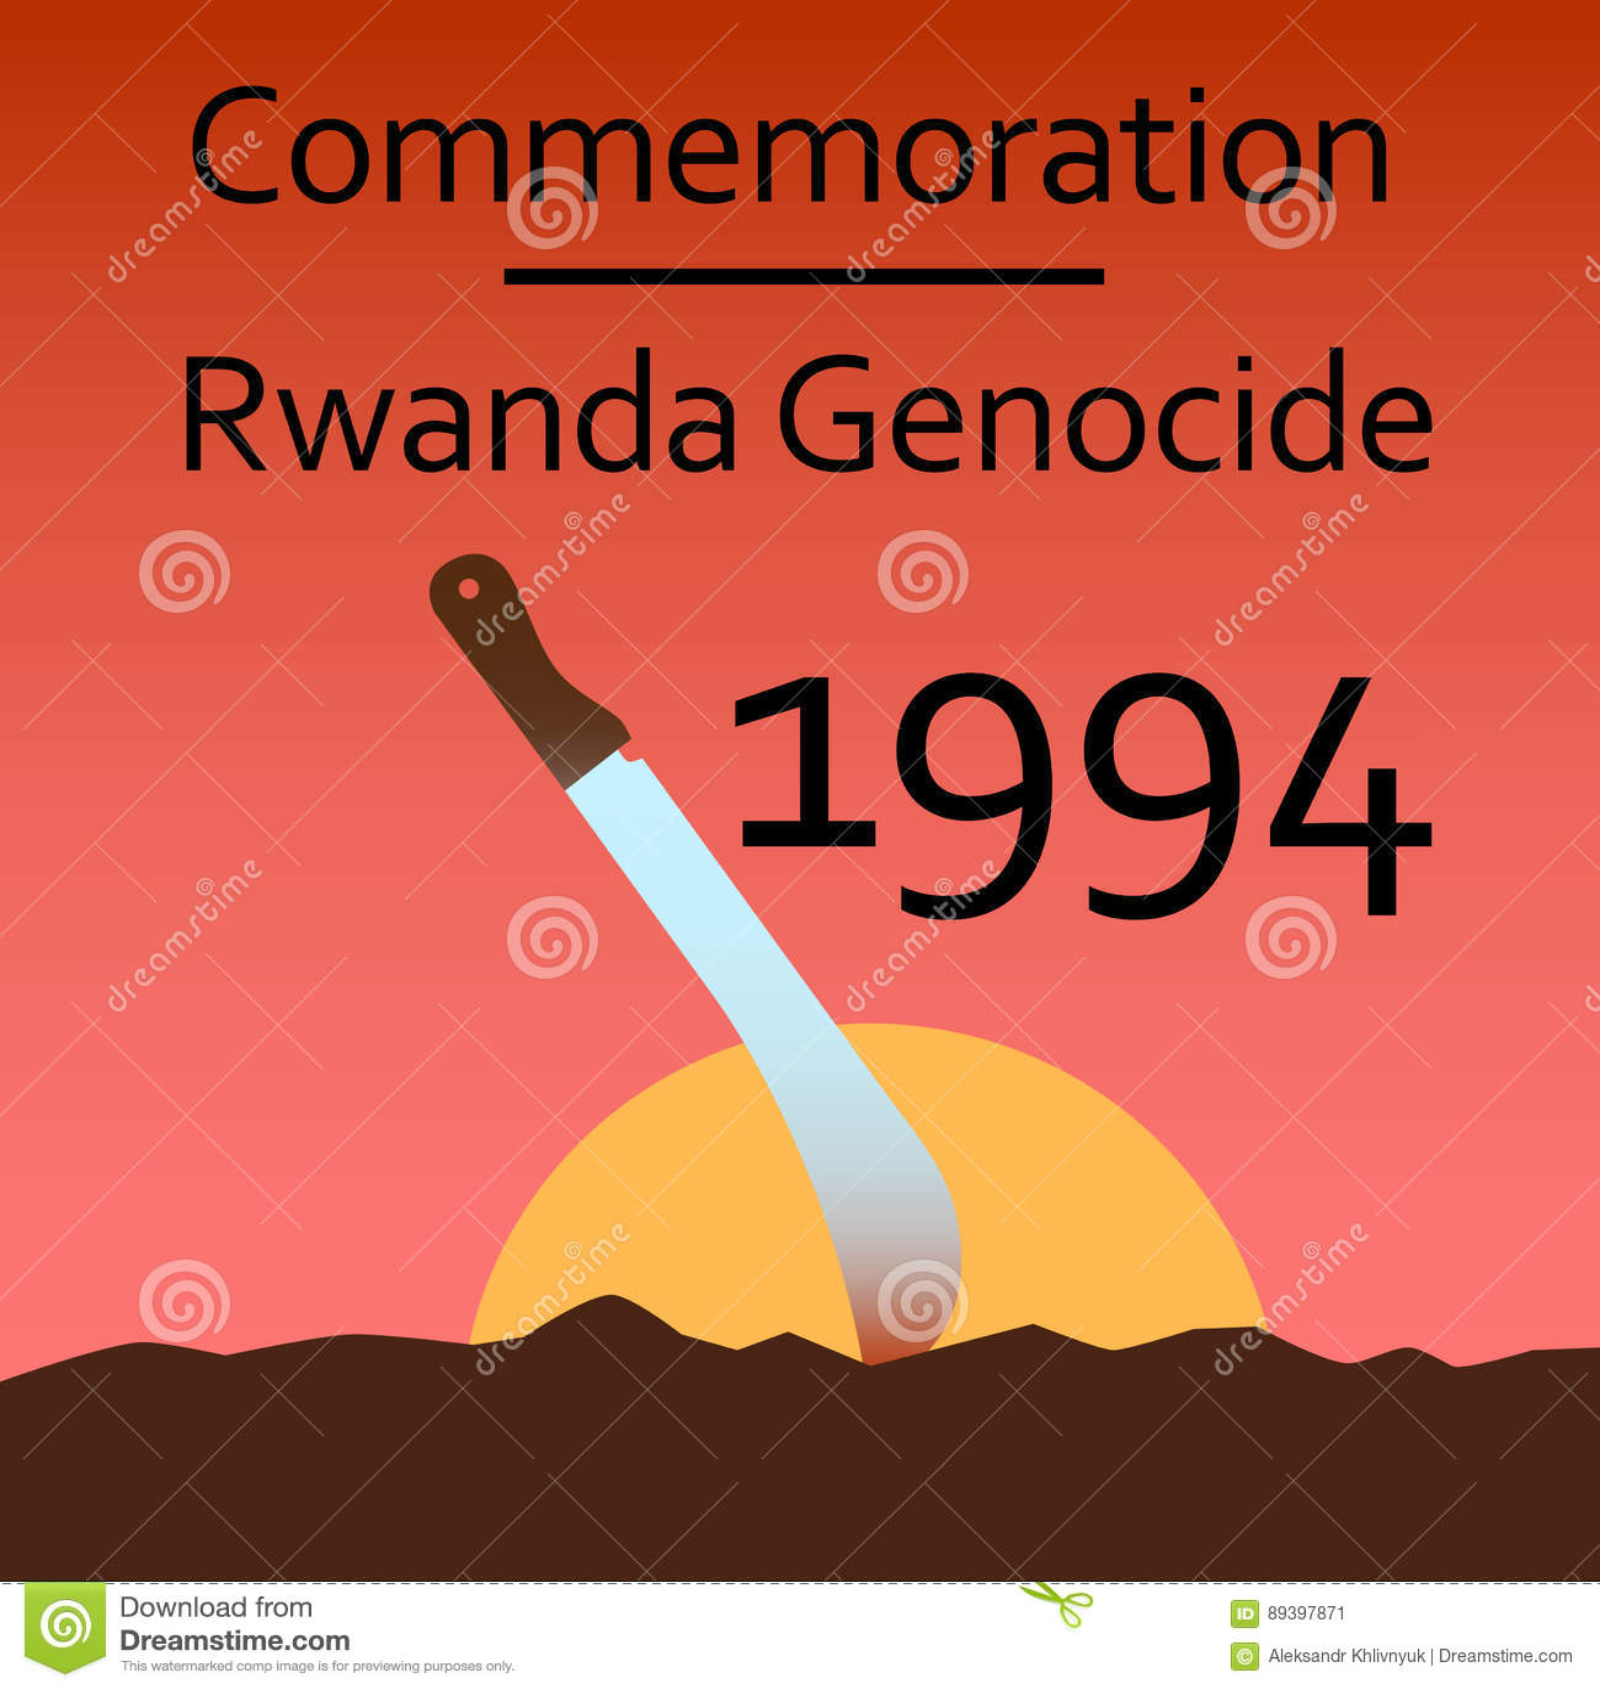 commemoration rwanda genocide stock image image of bosnia ethnic